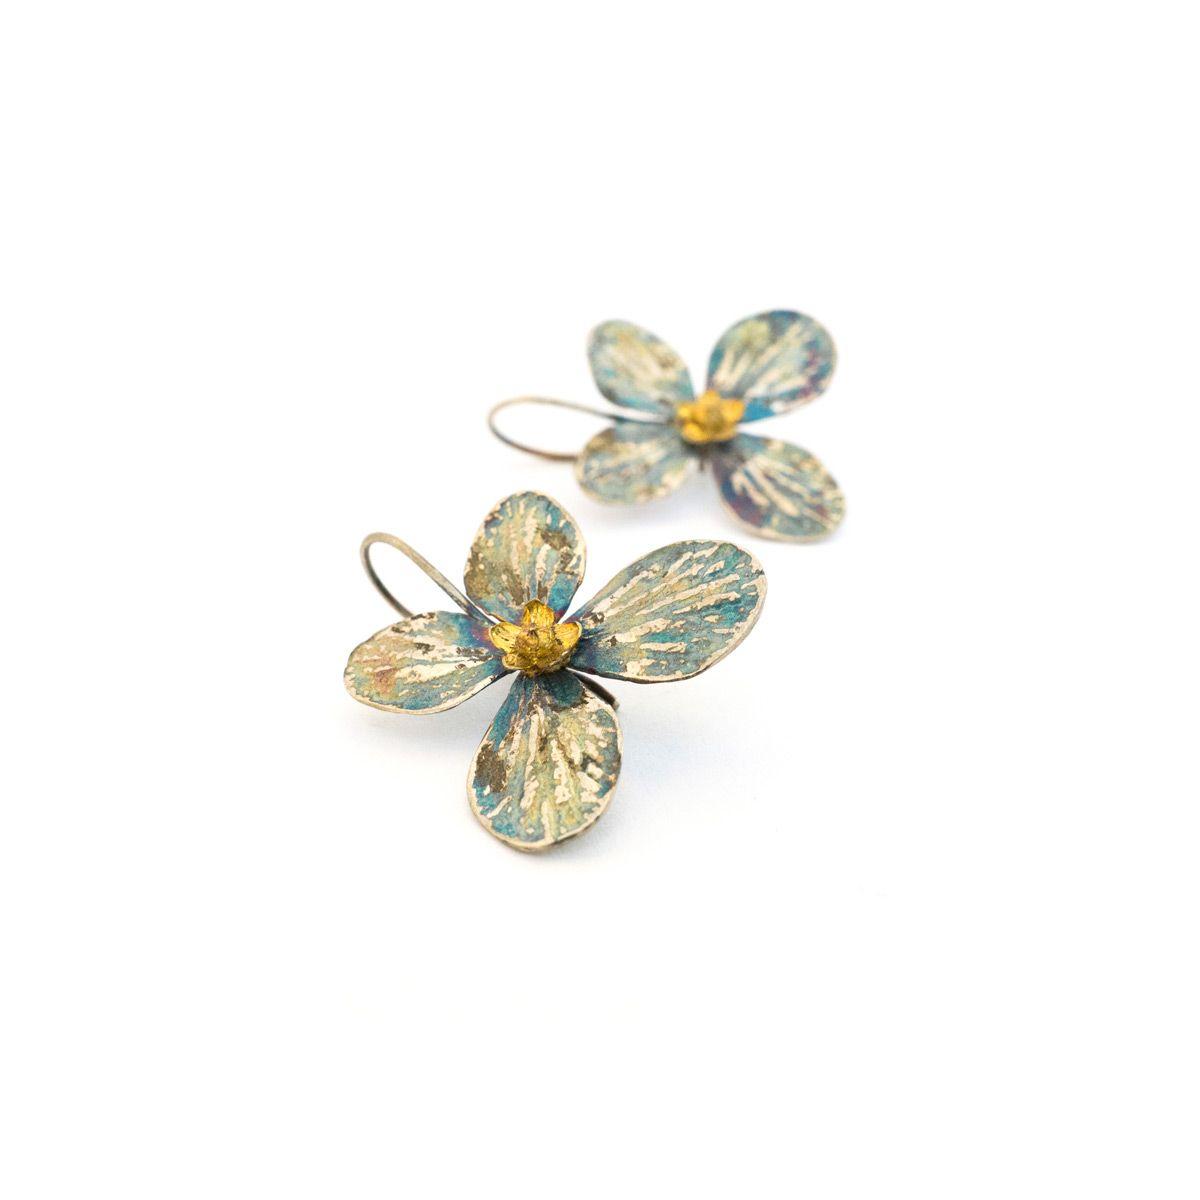 7009c2c9819 Sifis Jewellery - Αρχική | B jewelry - ears | Pinterest